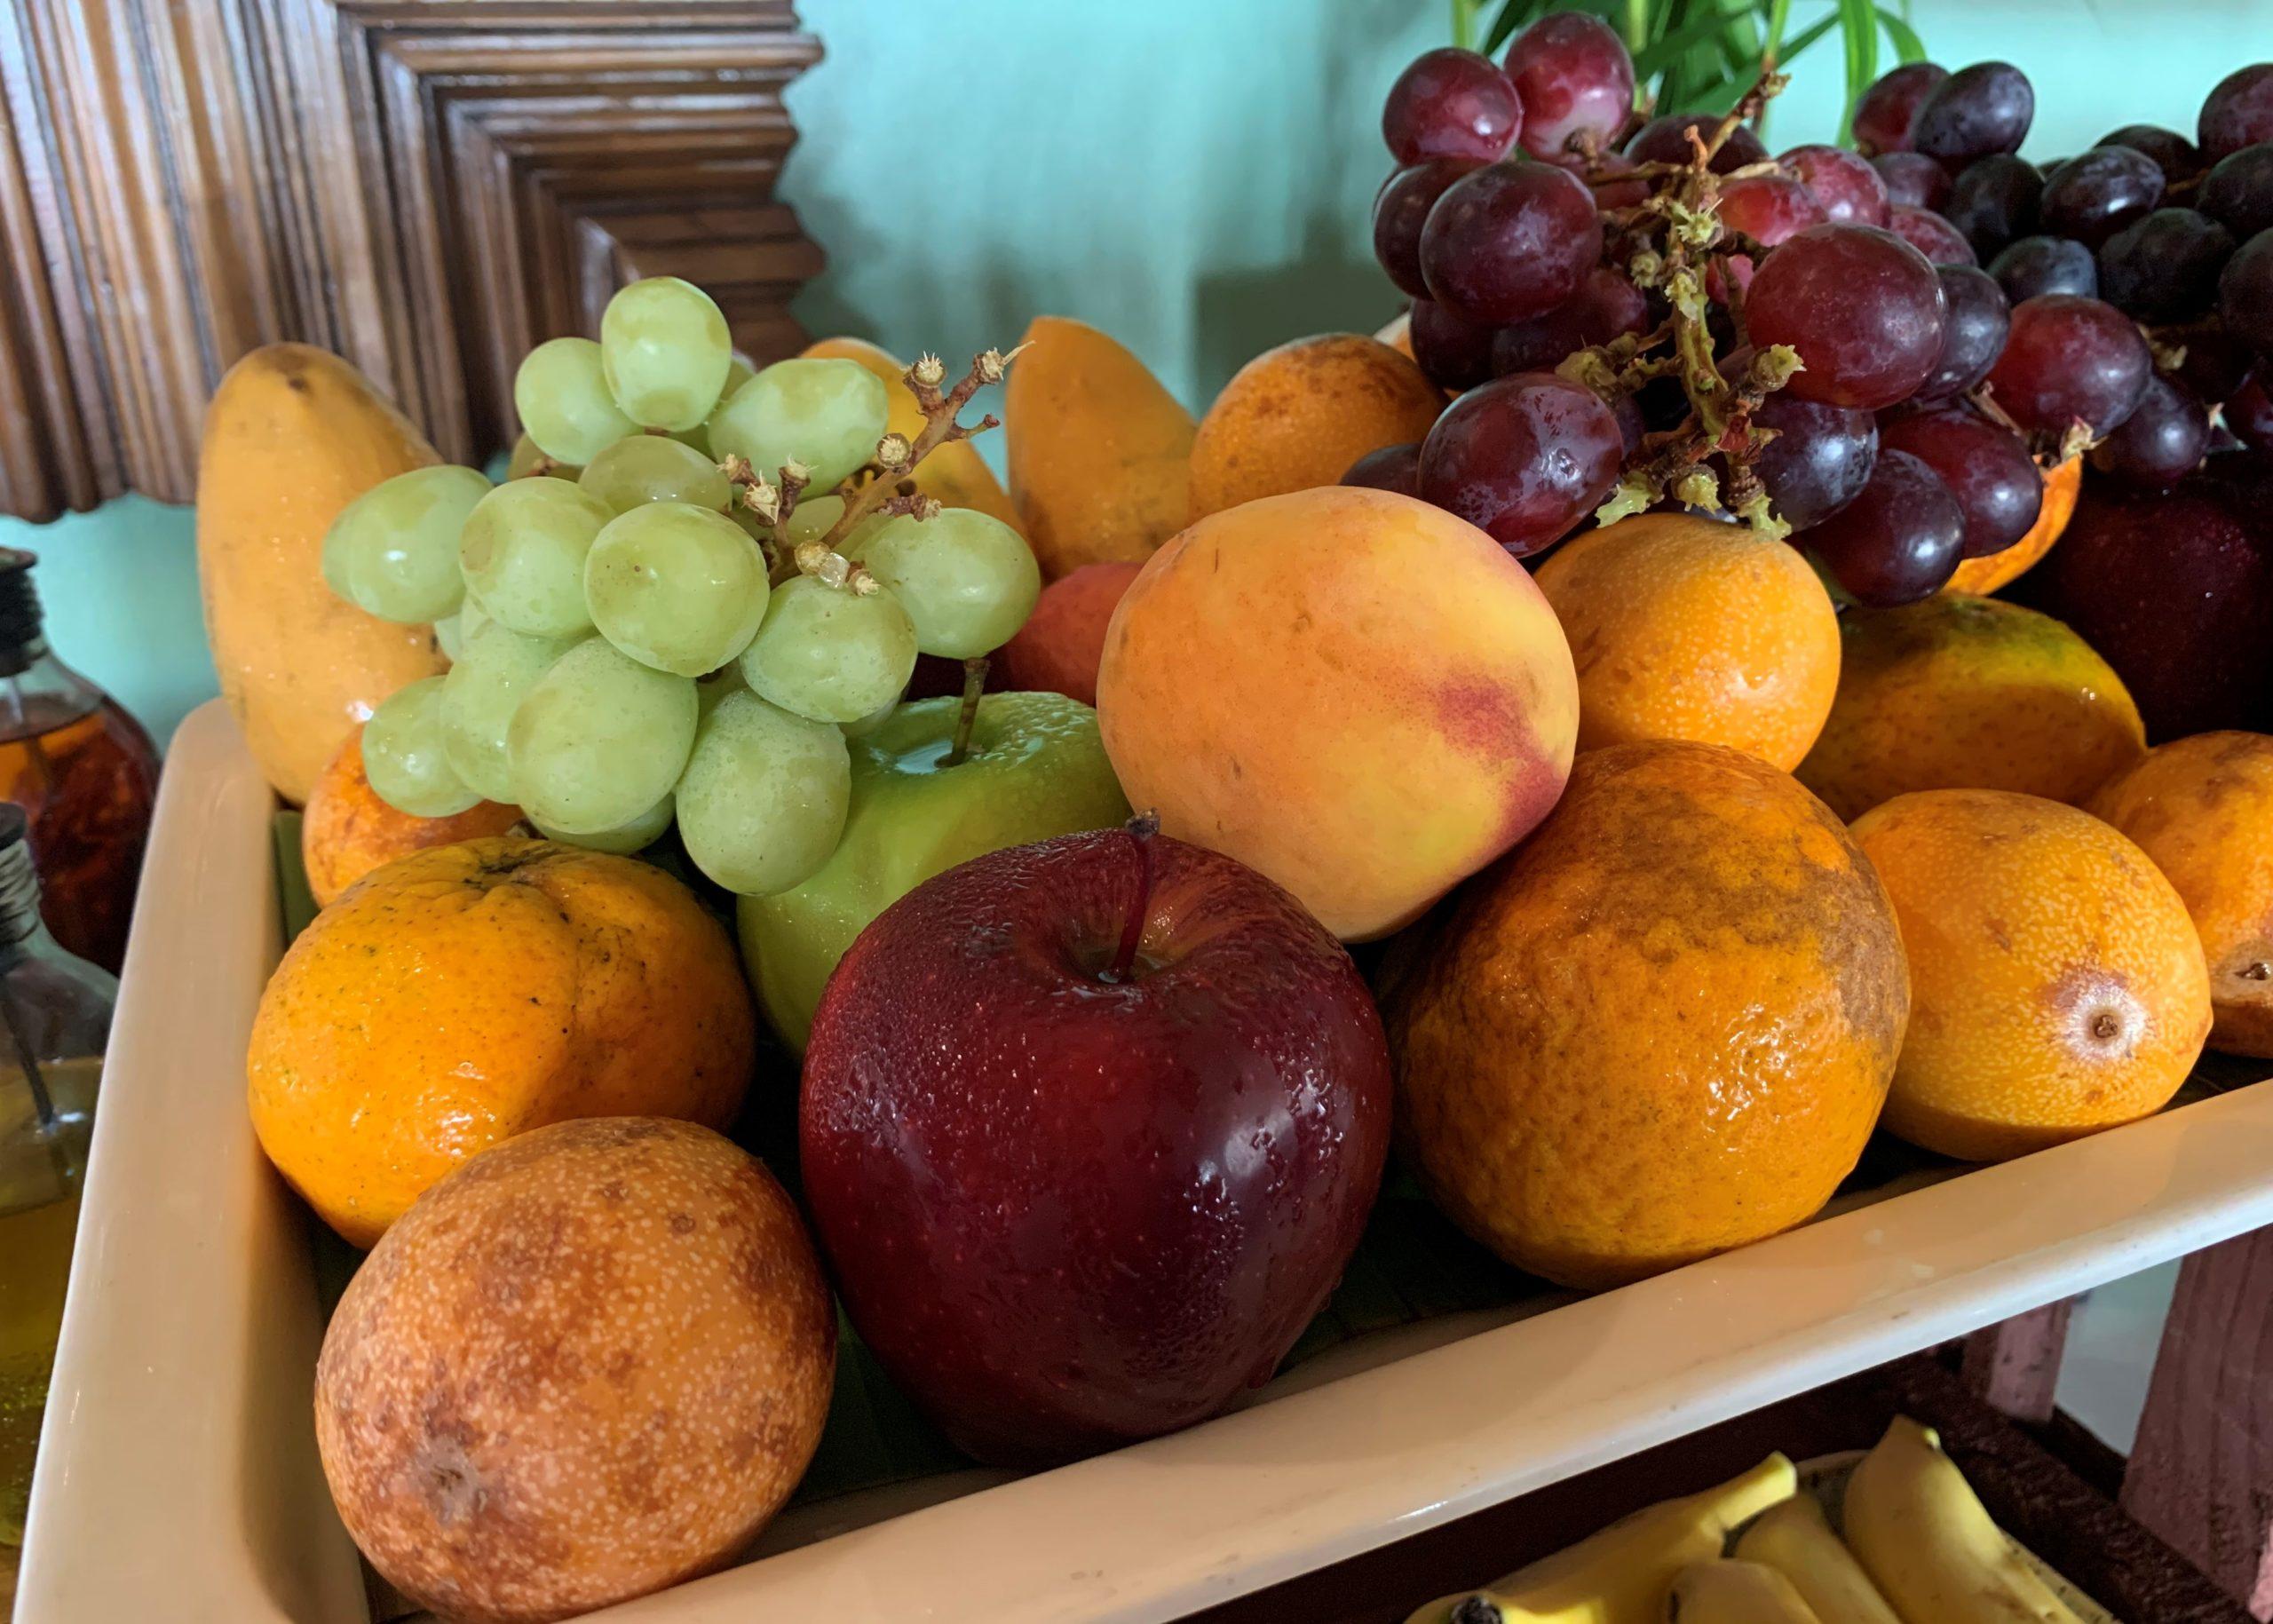 Grapes Passion Fruit Oranges Apples Mangos Mahekal Beach Resort Playa del Carmen Fruit Photos IMG_0951